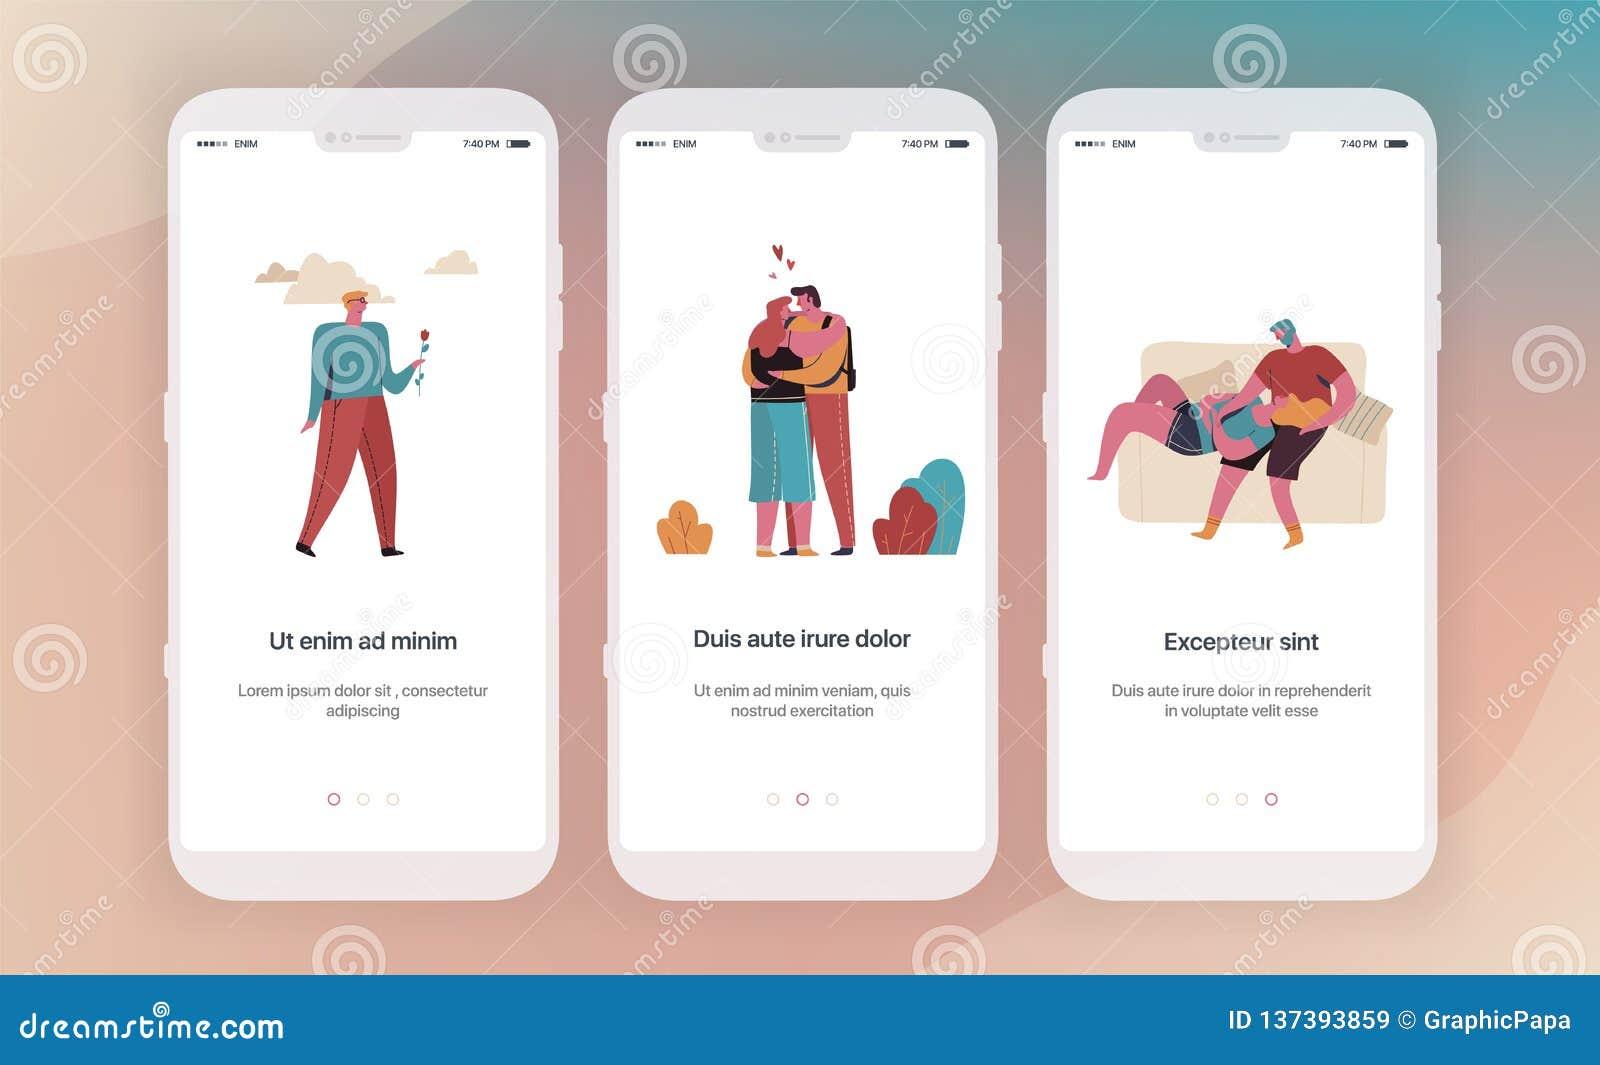 Match Making Kundli pour le mariage en hindi